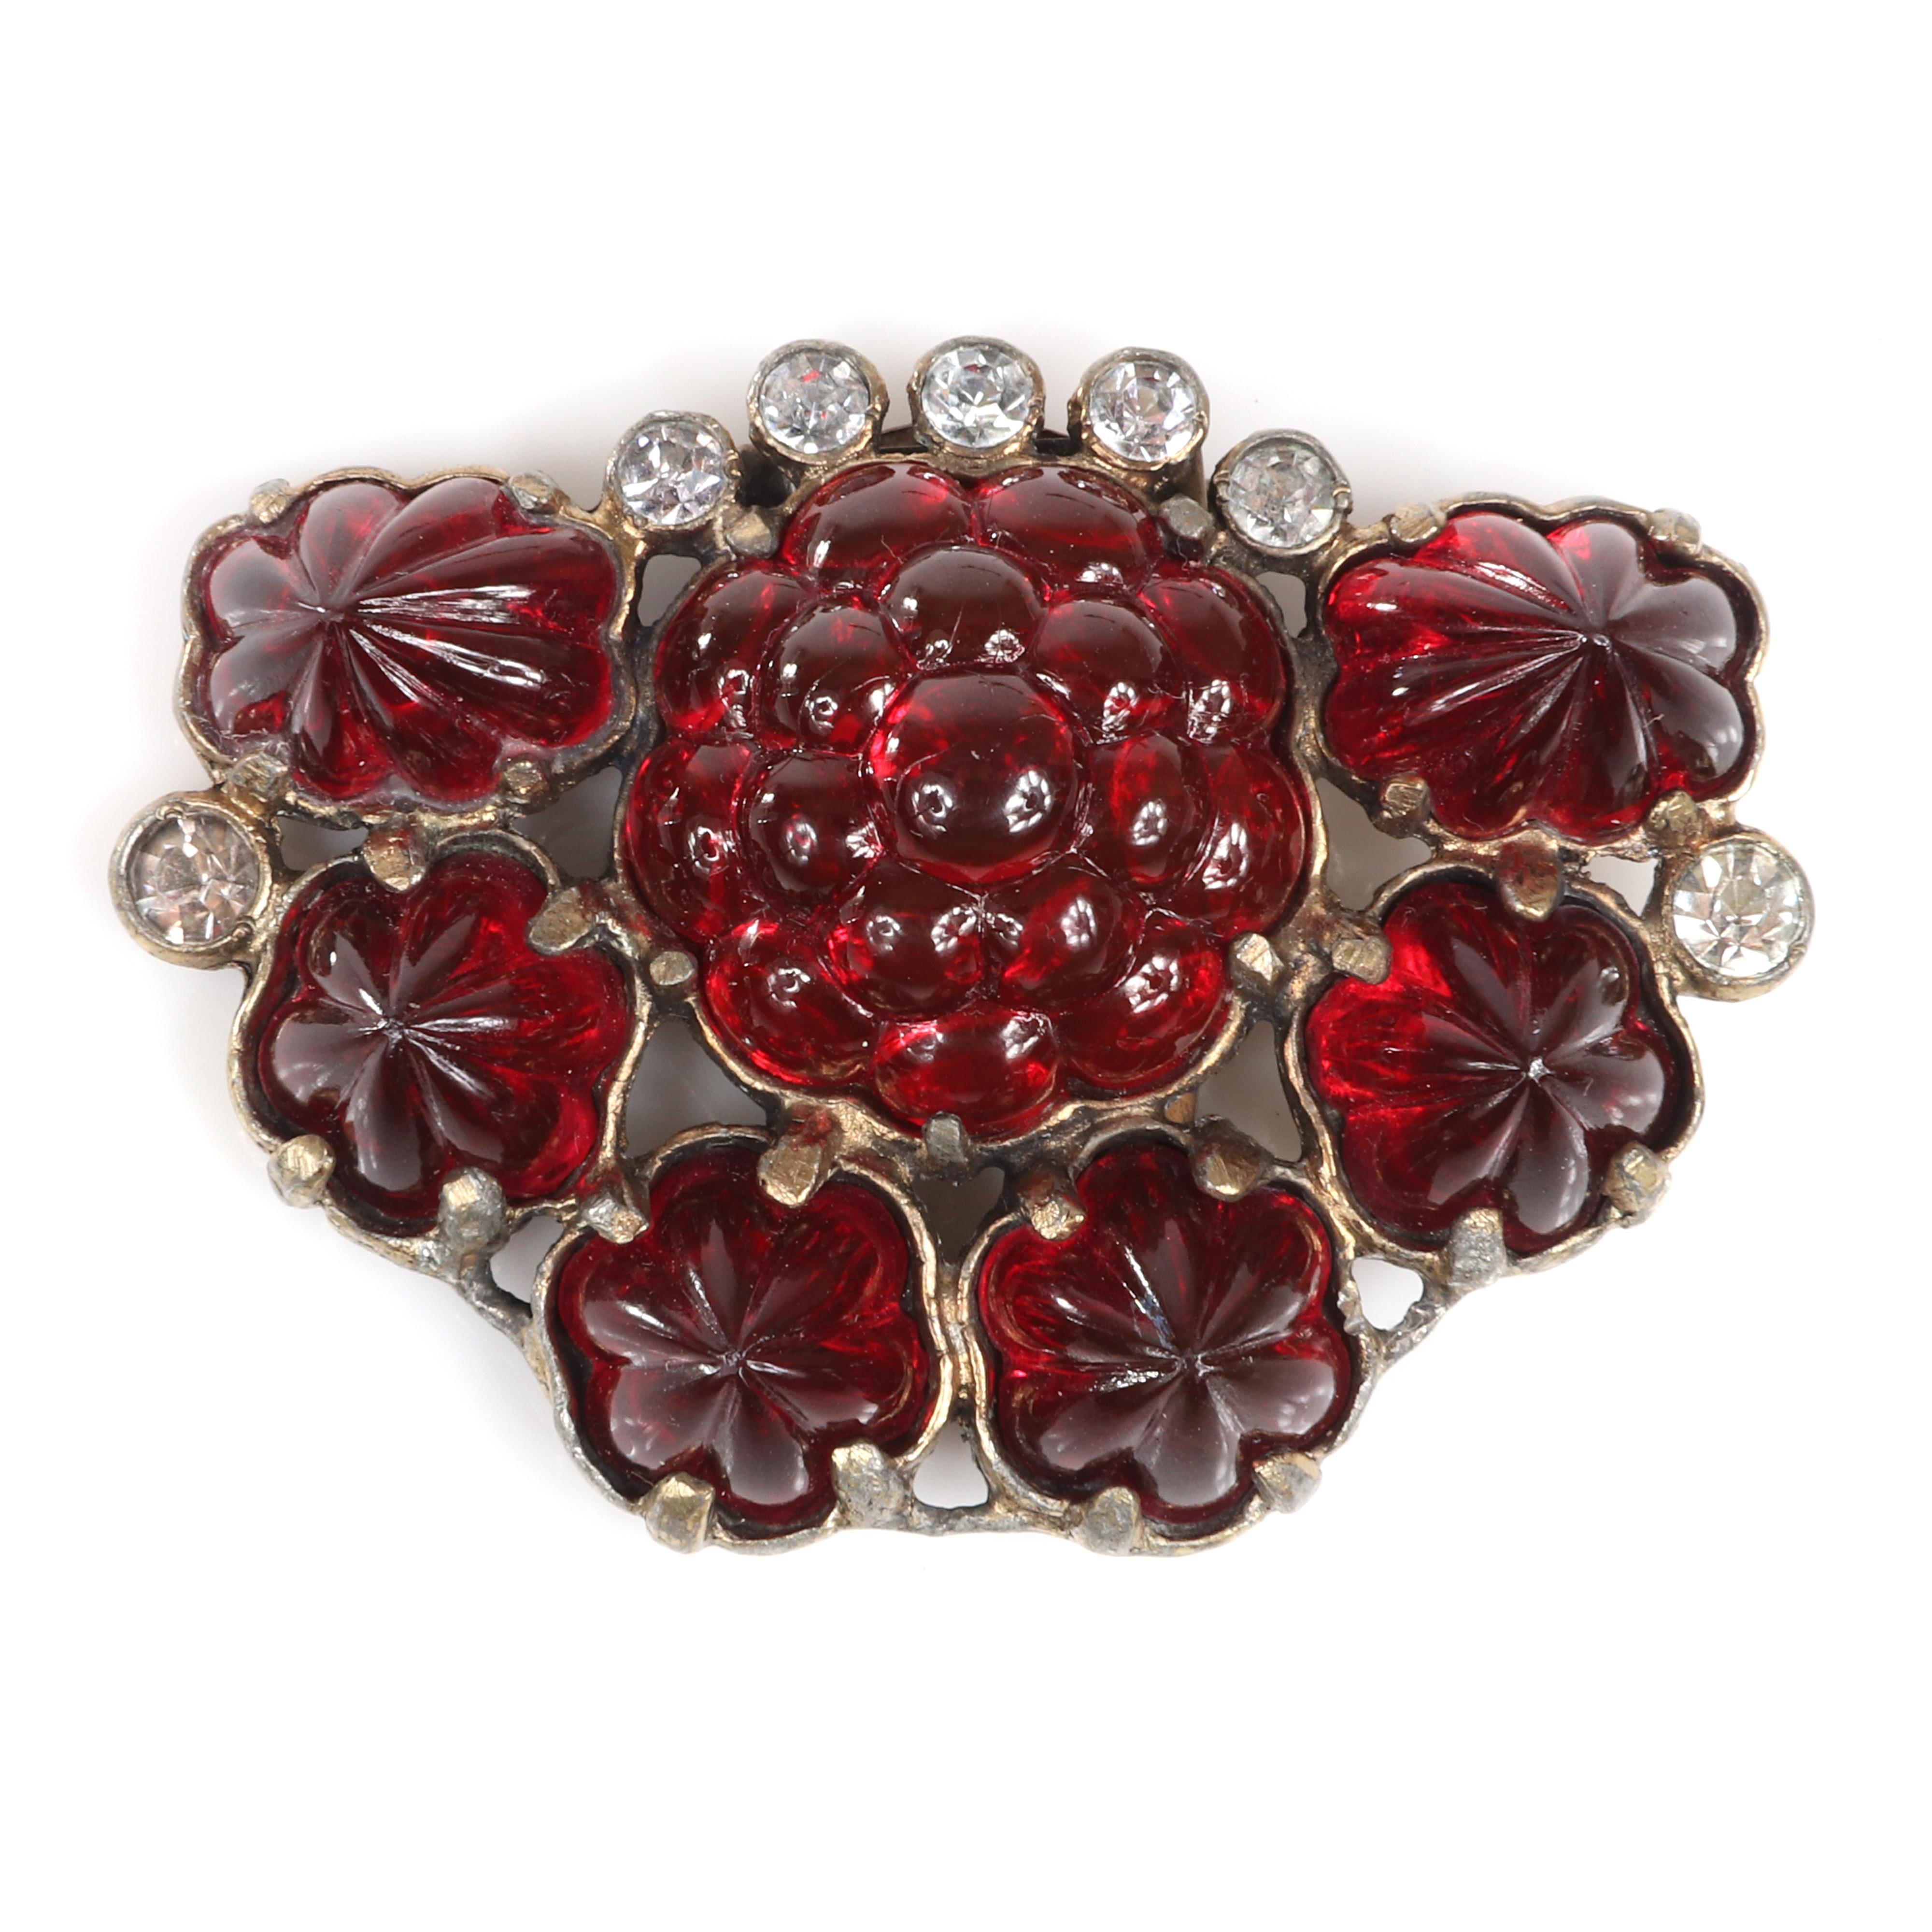 "Eisenberg Original rare fruit salad ruby molded glass floral stones with bezel-set clear rhinestones, c. 1930s. 1 5/8"" x 2"""